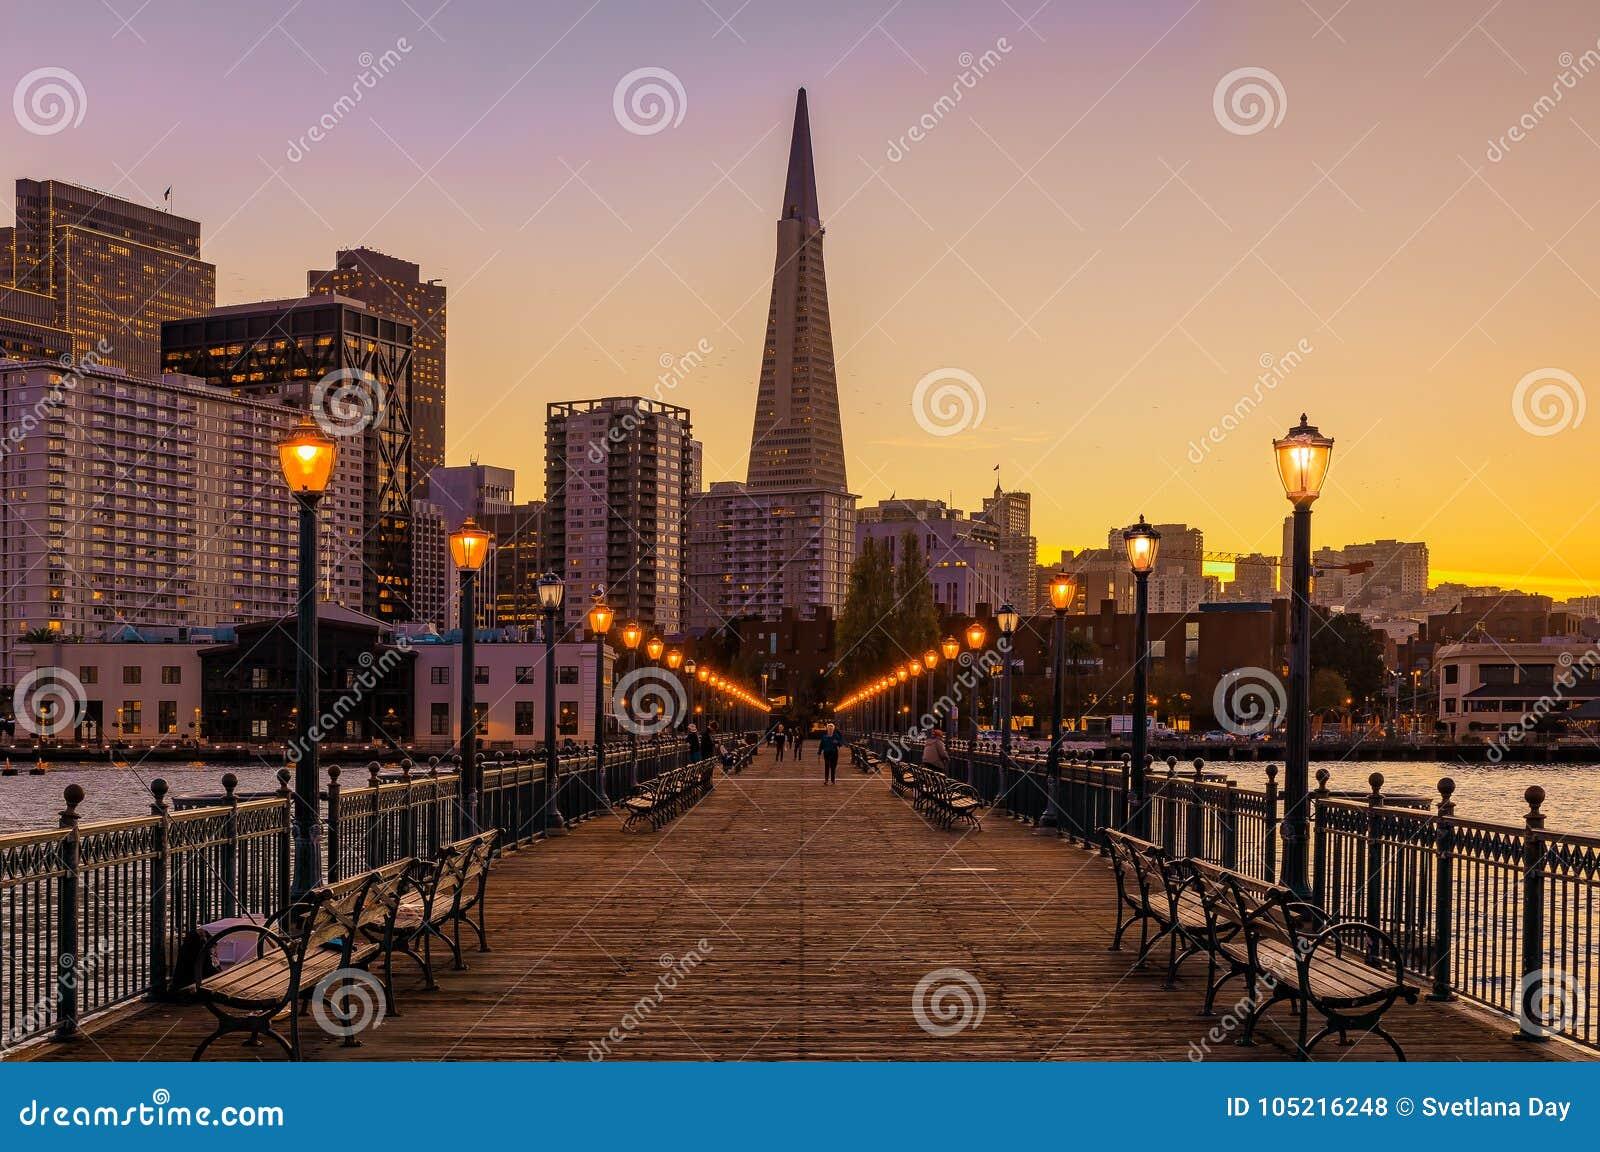 downtown san francisco and the transamerica pyramid at chrismas